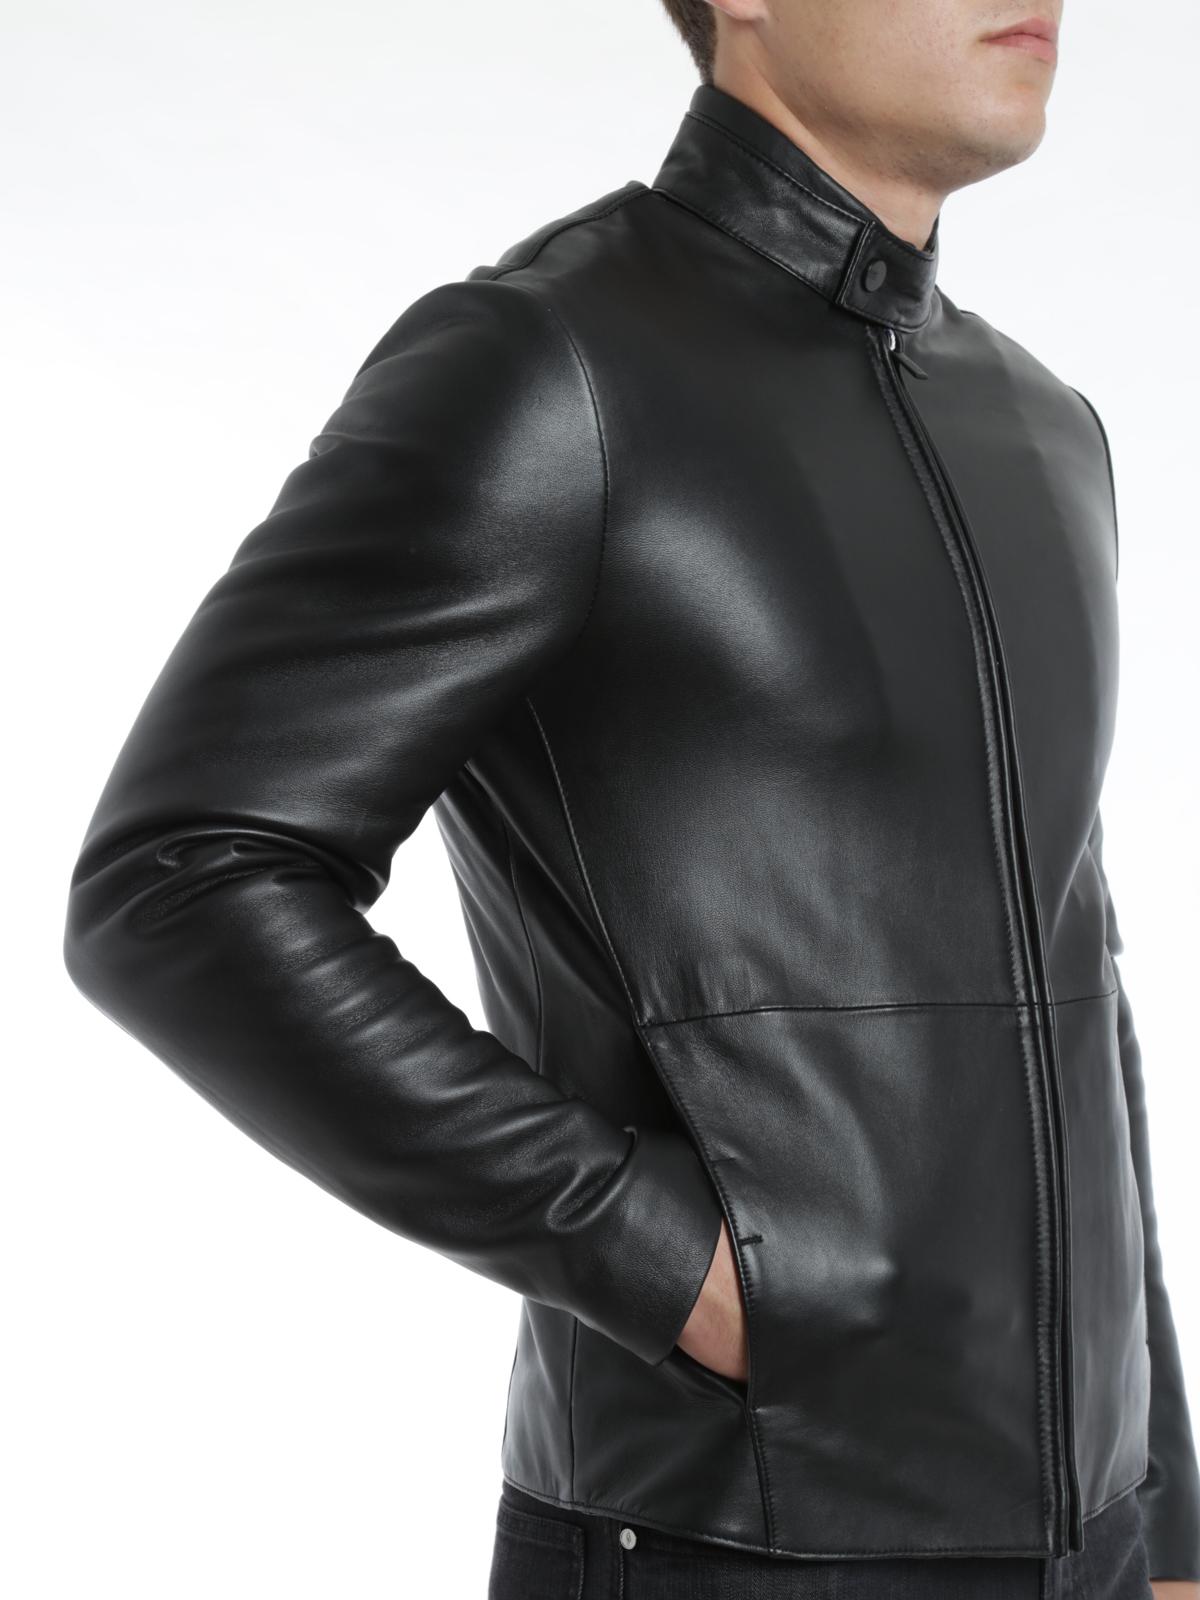 online store aa7ca 691aa Armani Collezioni - Giacca in pelle imbottita - giacche in ...